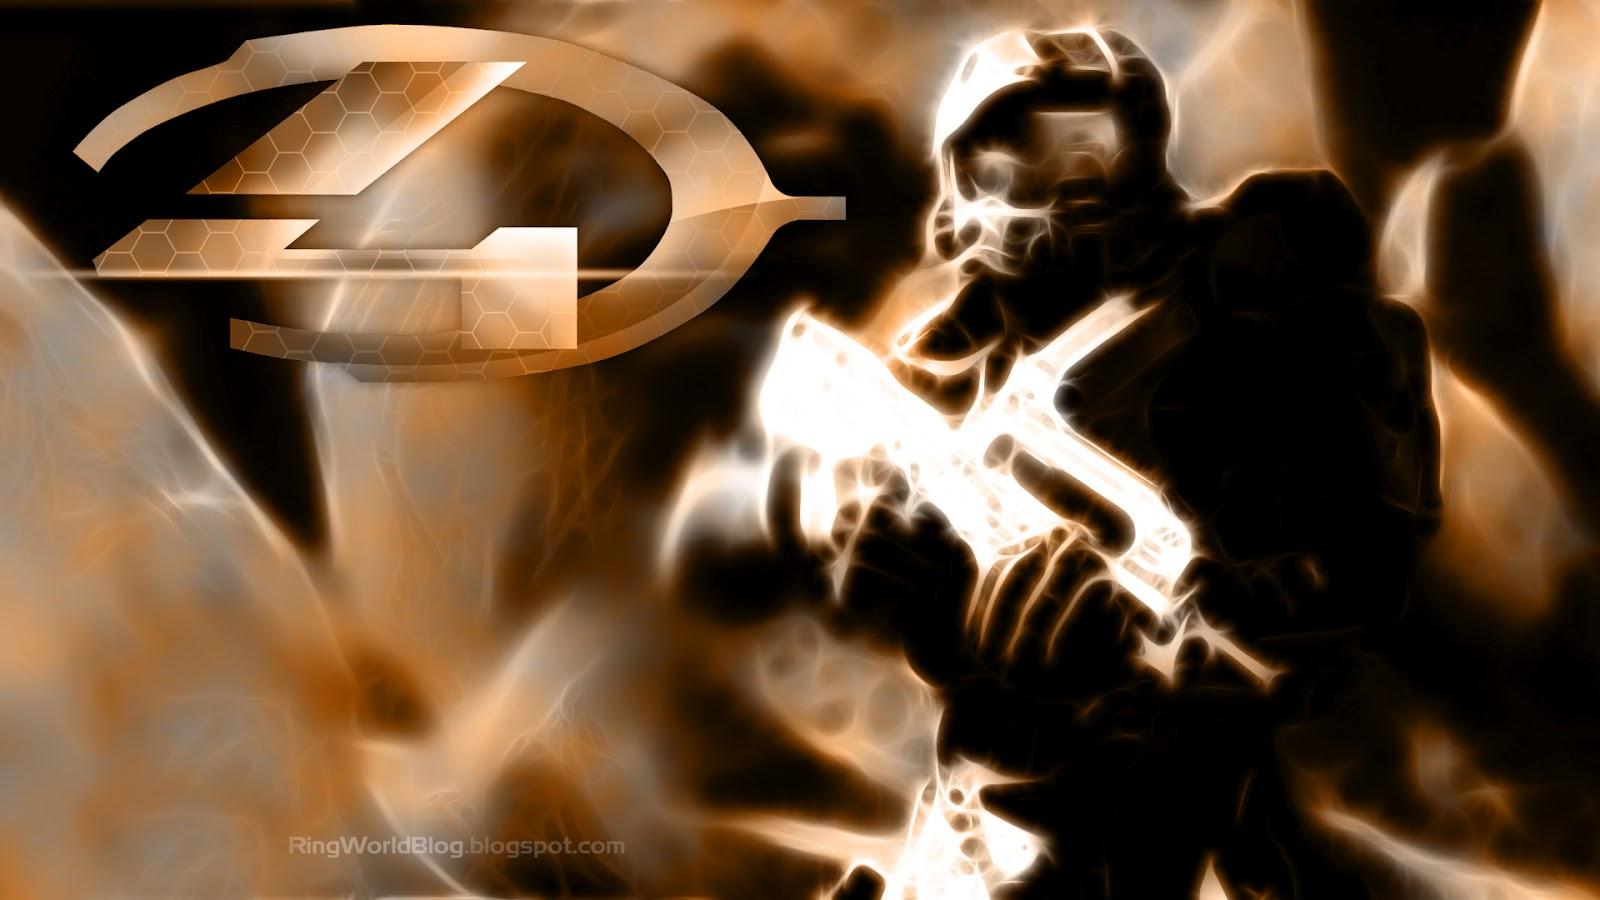 http://2.bp.blogspot.com/-lx5NJNg_XVo/T9dvzFpnUrI/AAAAAAAADD8/BnFYyg0S_MY/s1600/Halo-4-HD-Wallpaper.jpg